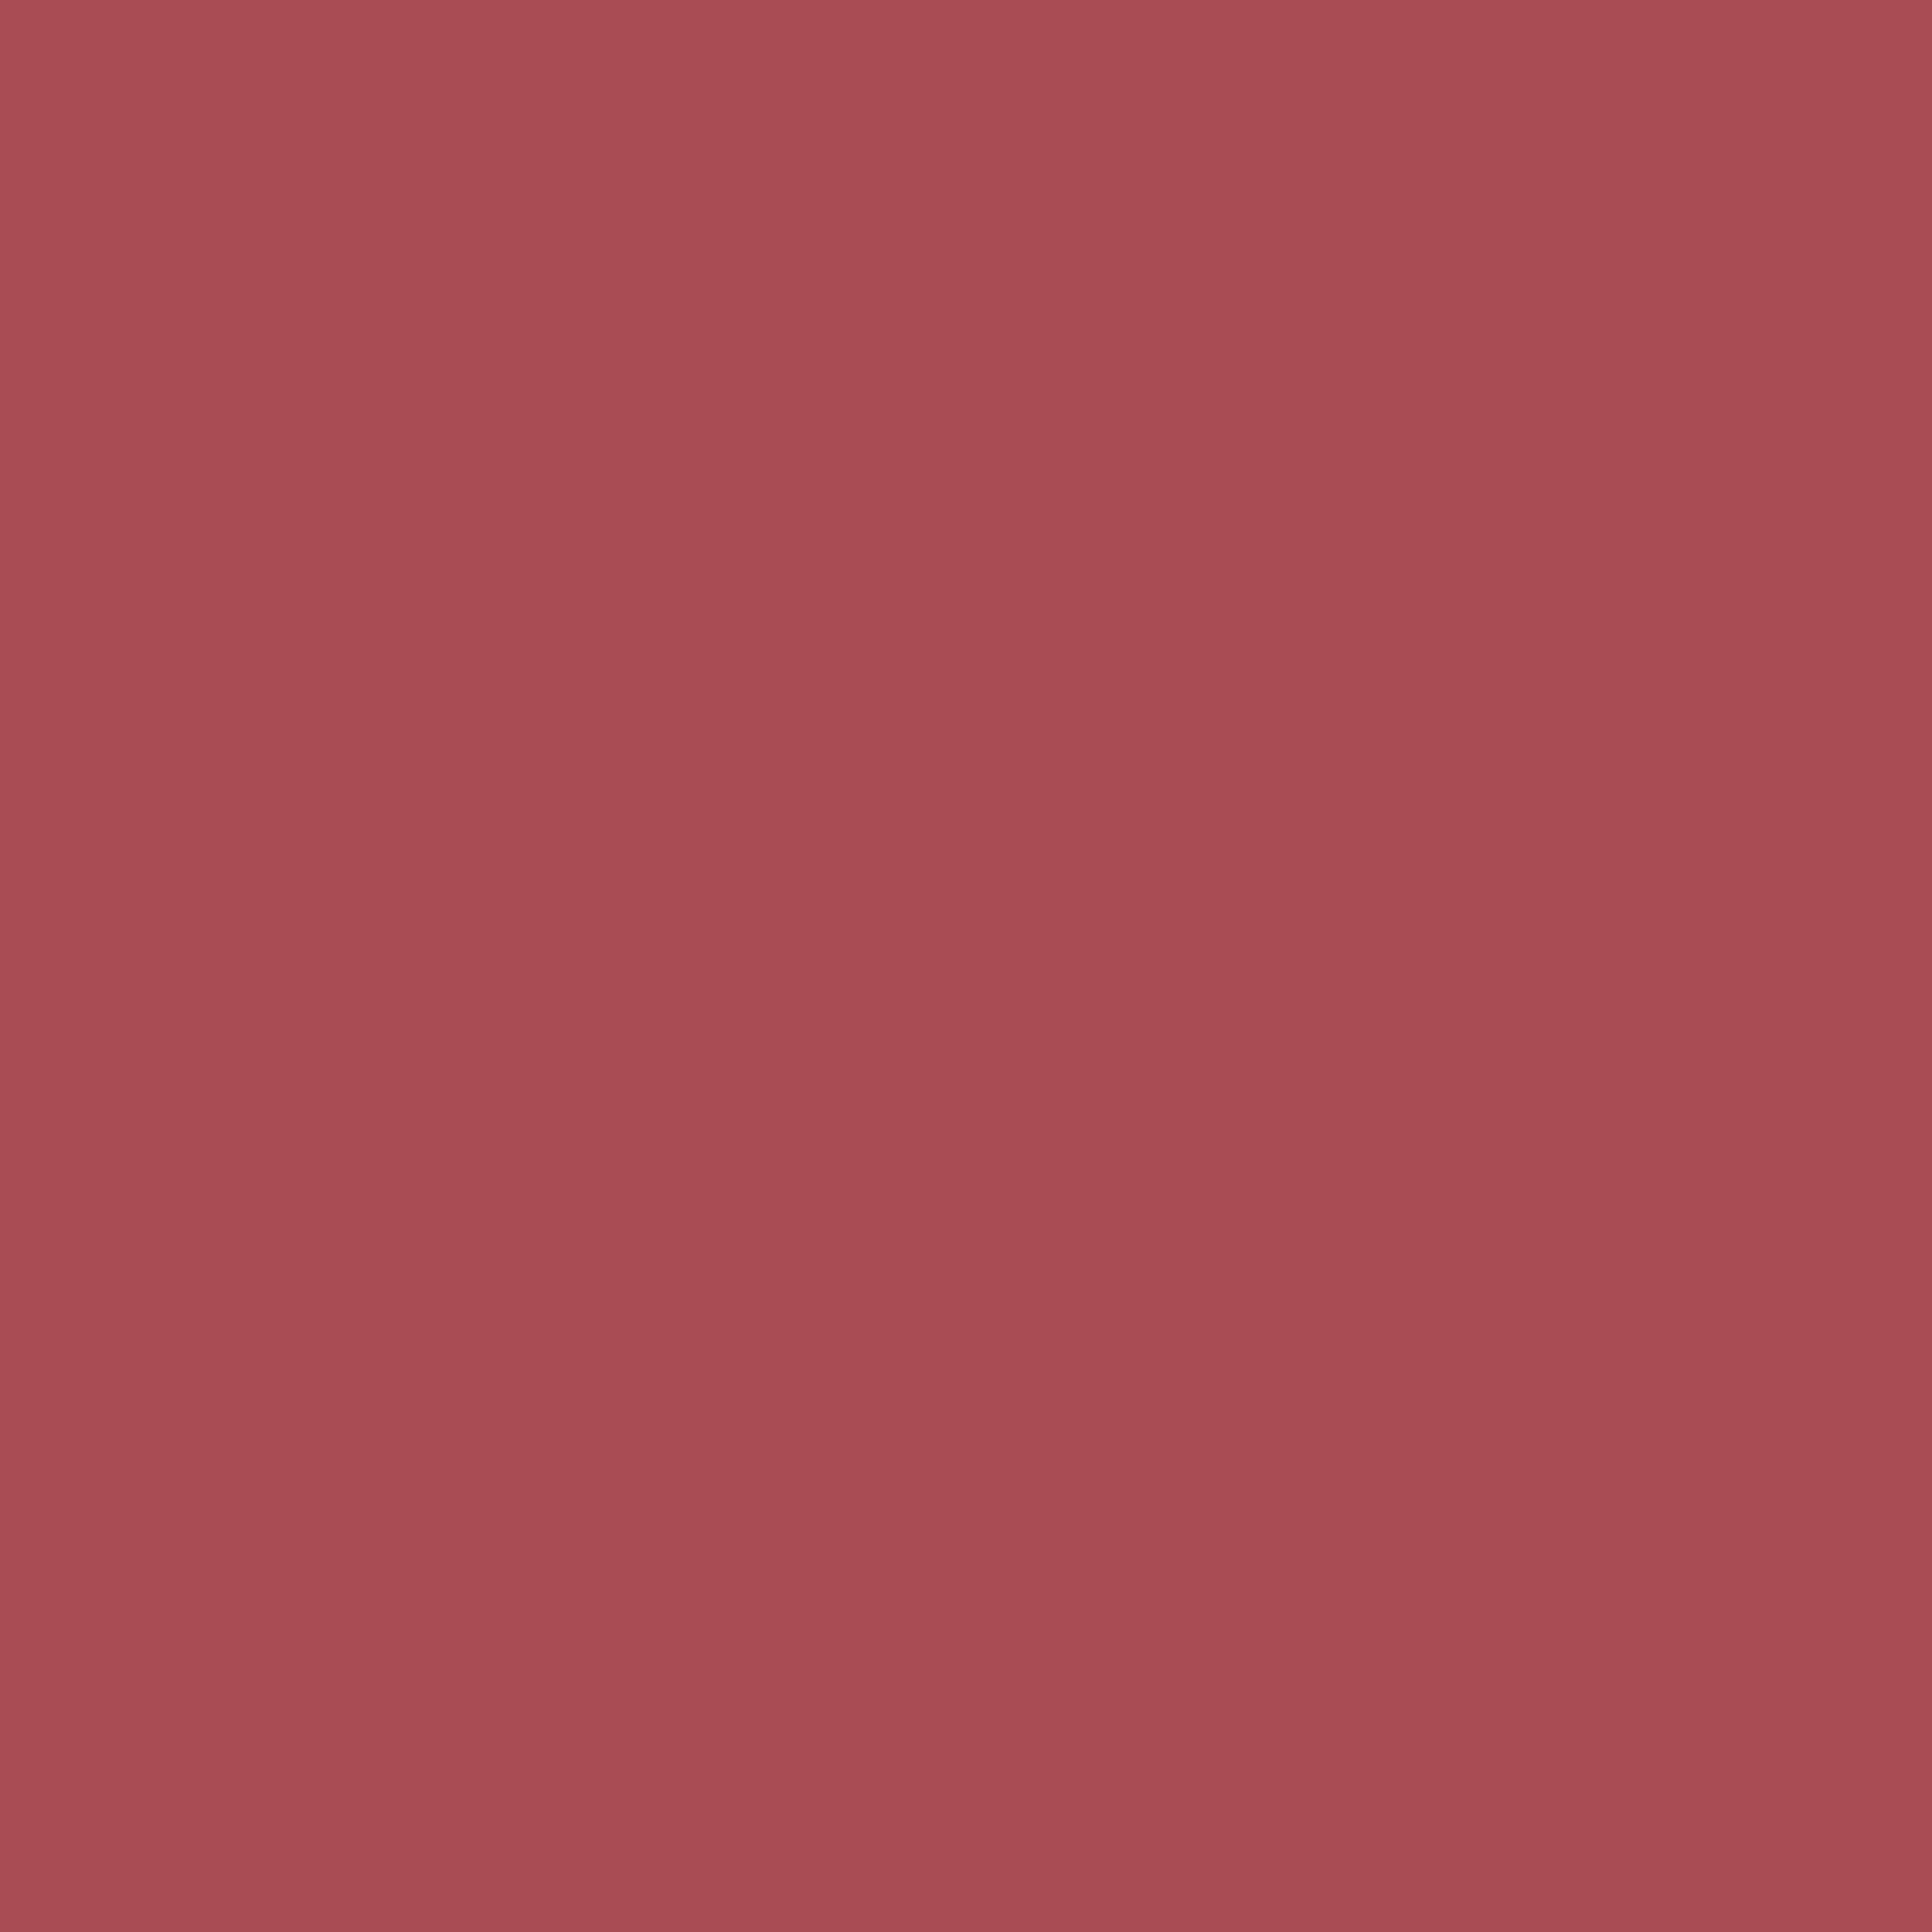 2048x2048 Rose Vale Solid Color Background